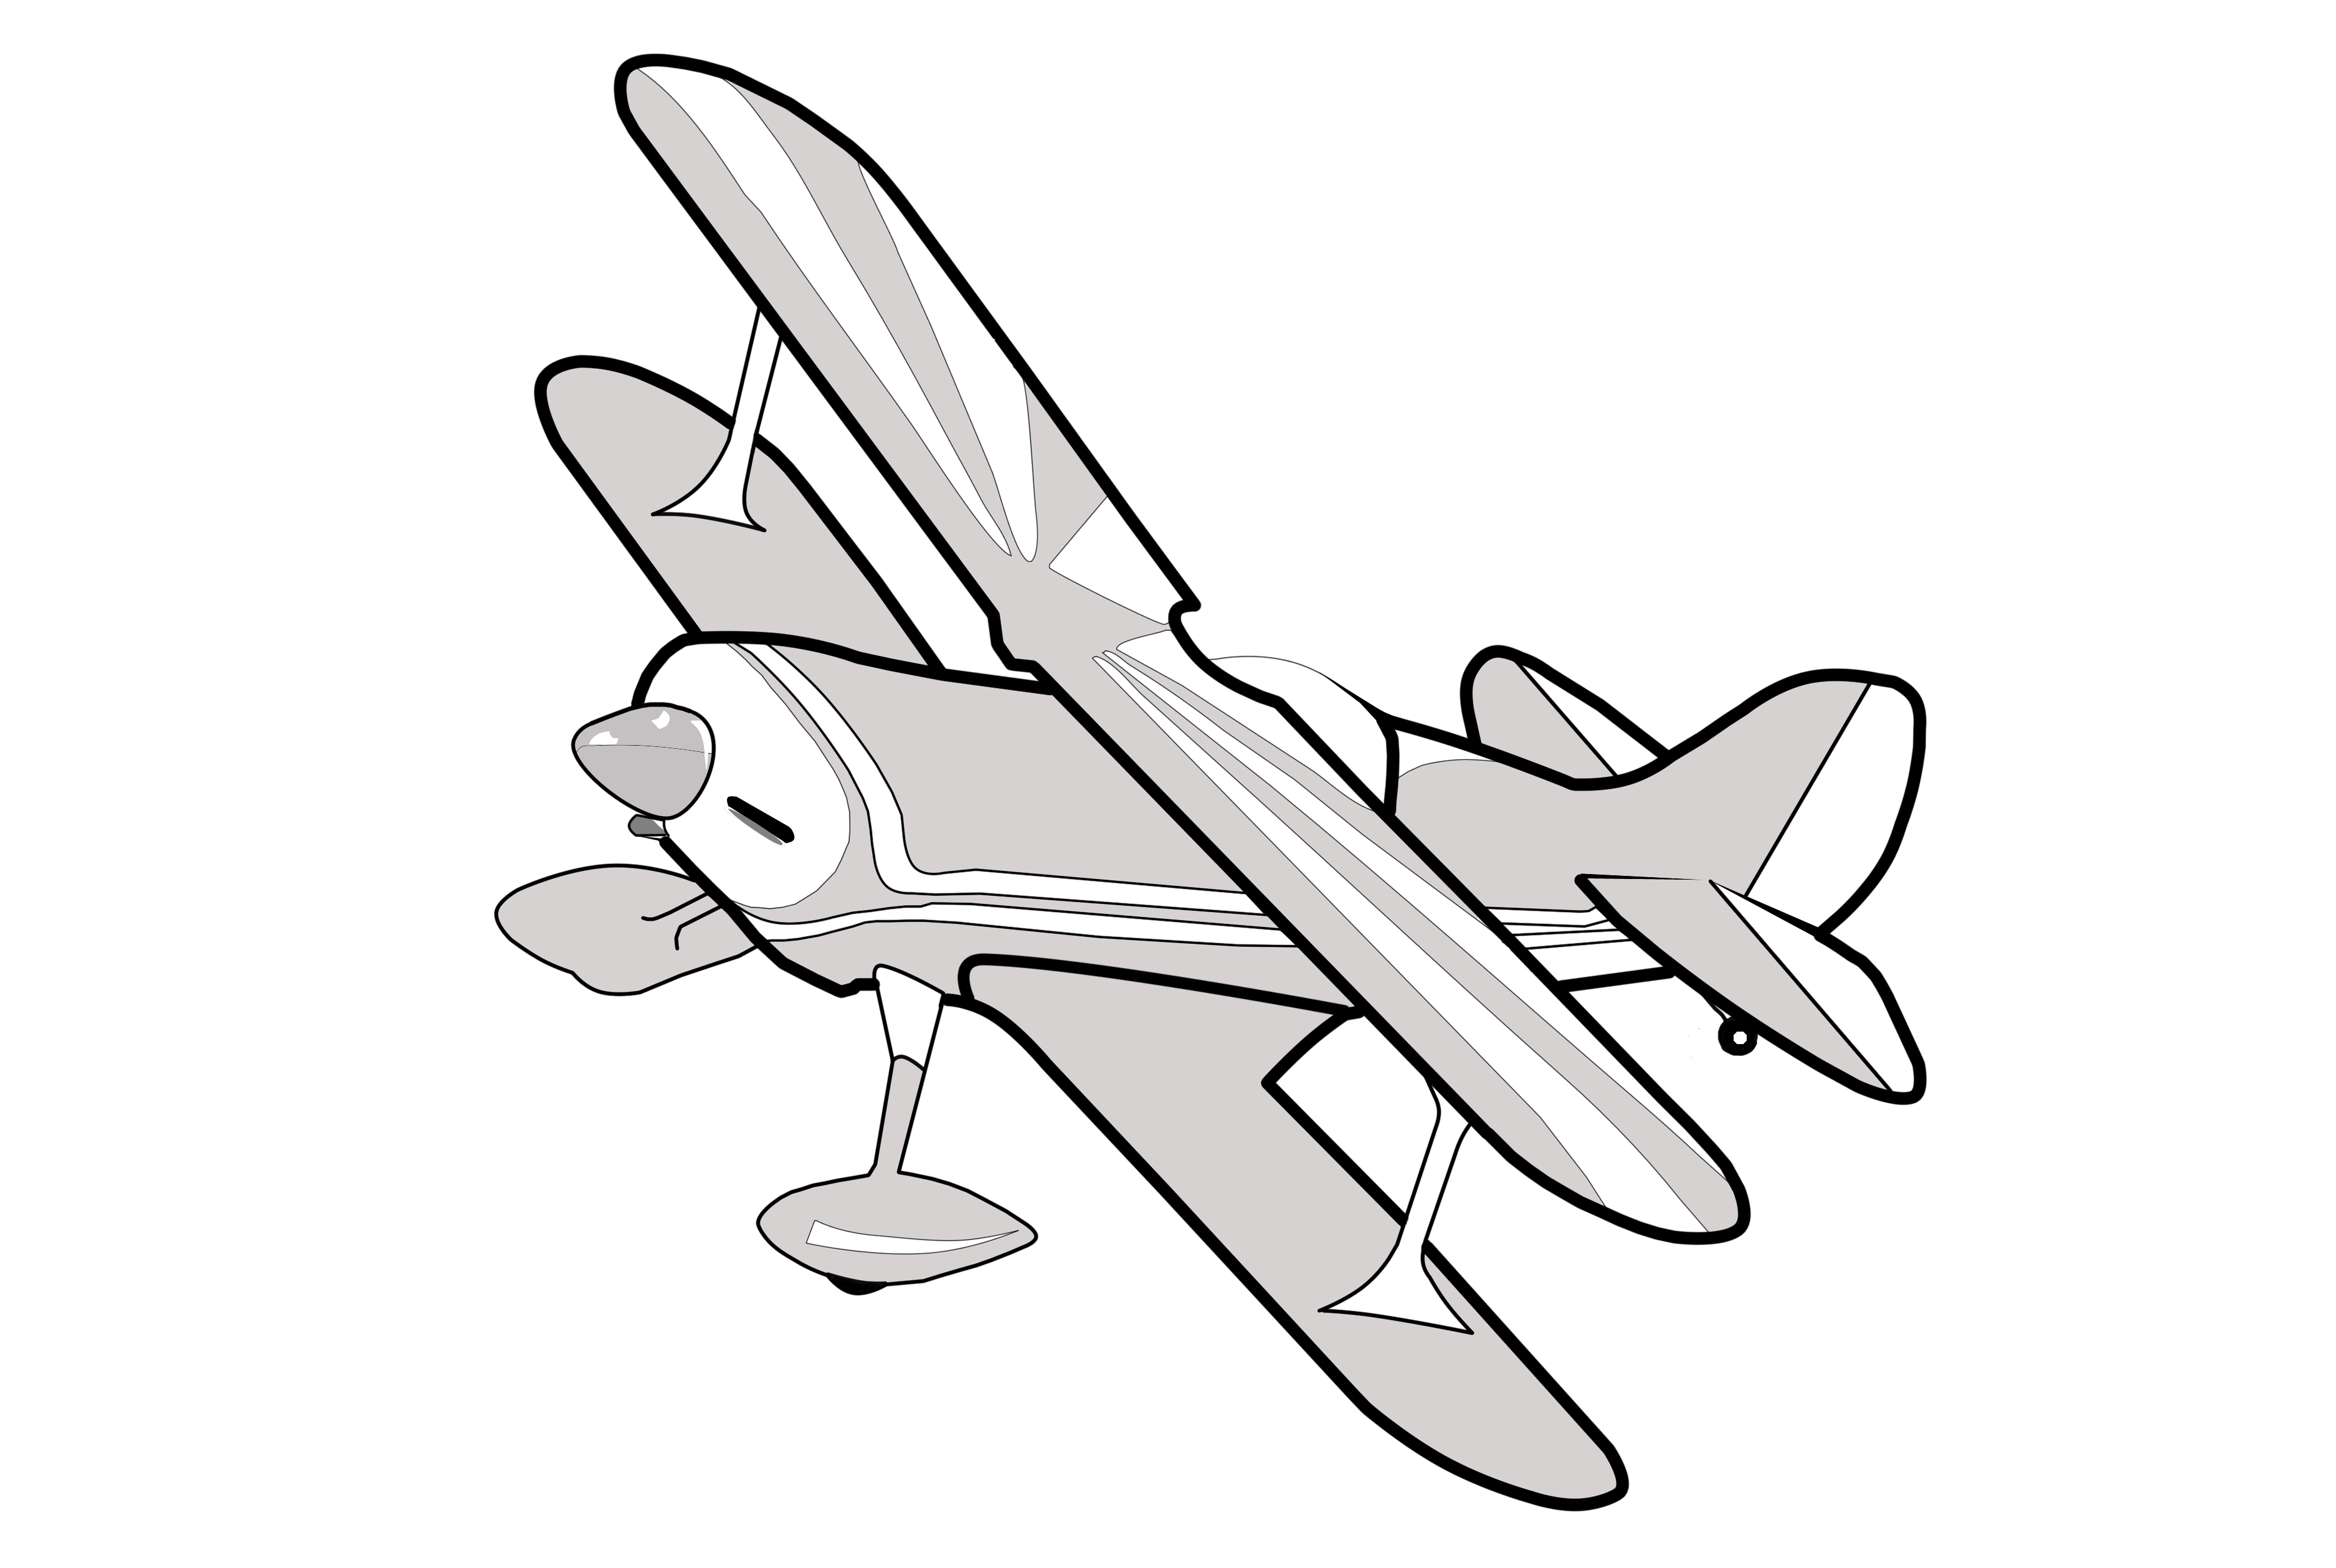 Grey Biplane Clipart Image-Grey Biplane Clipart Image-13